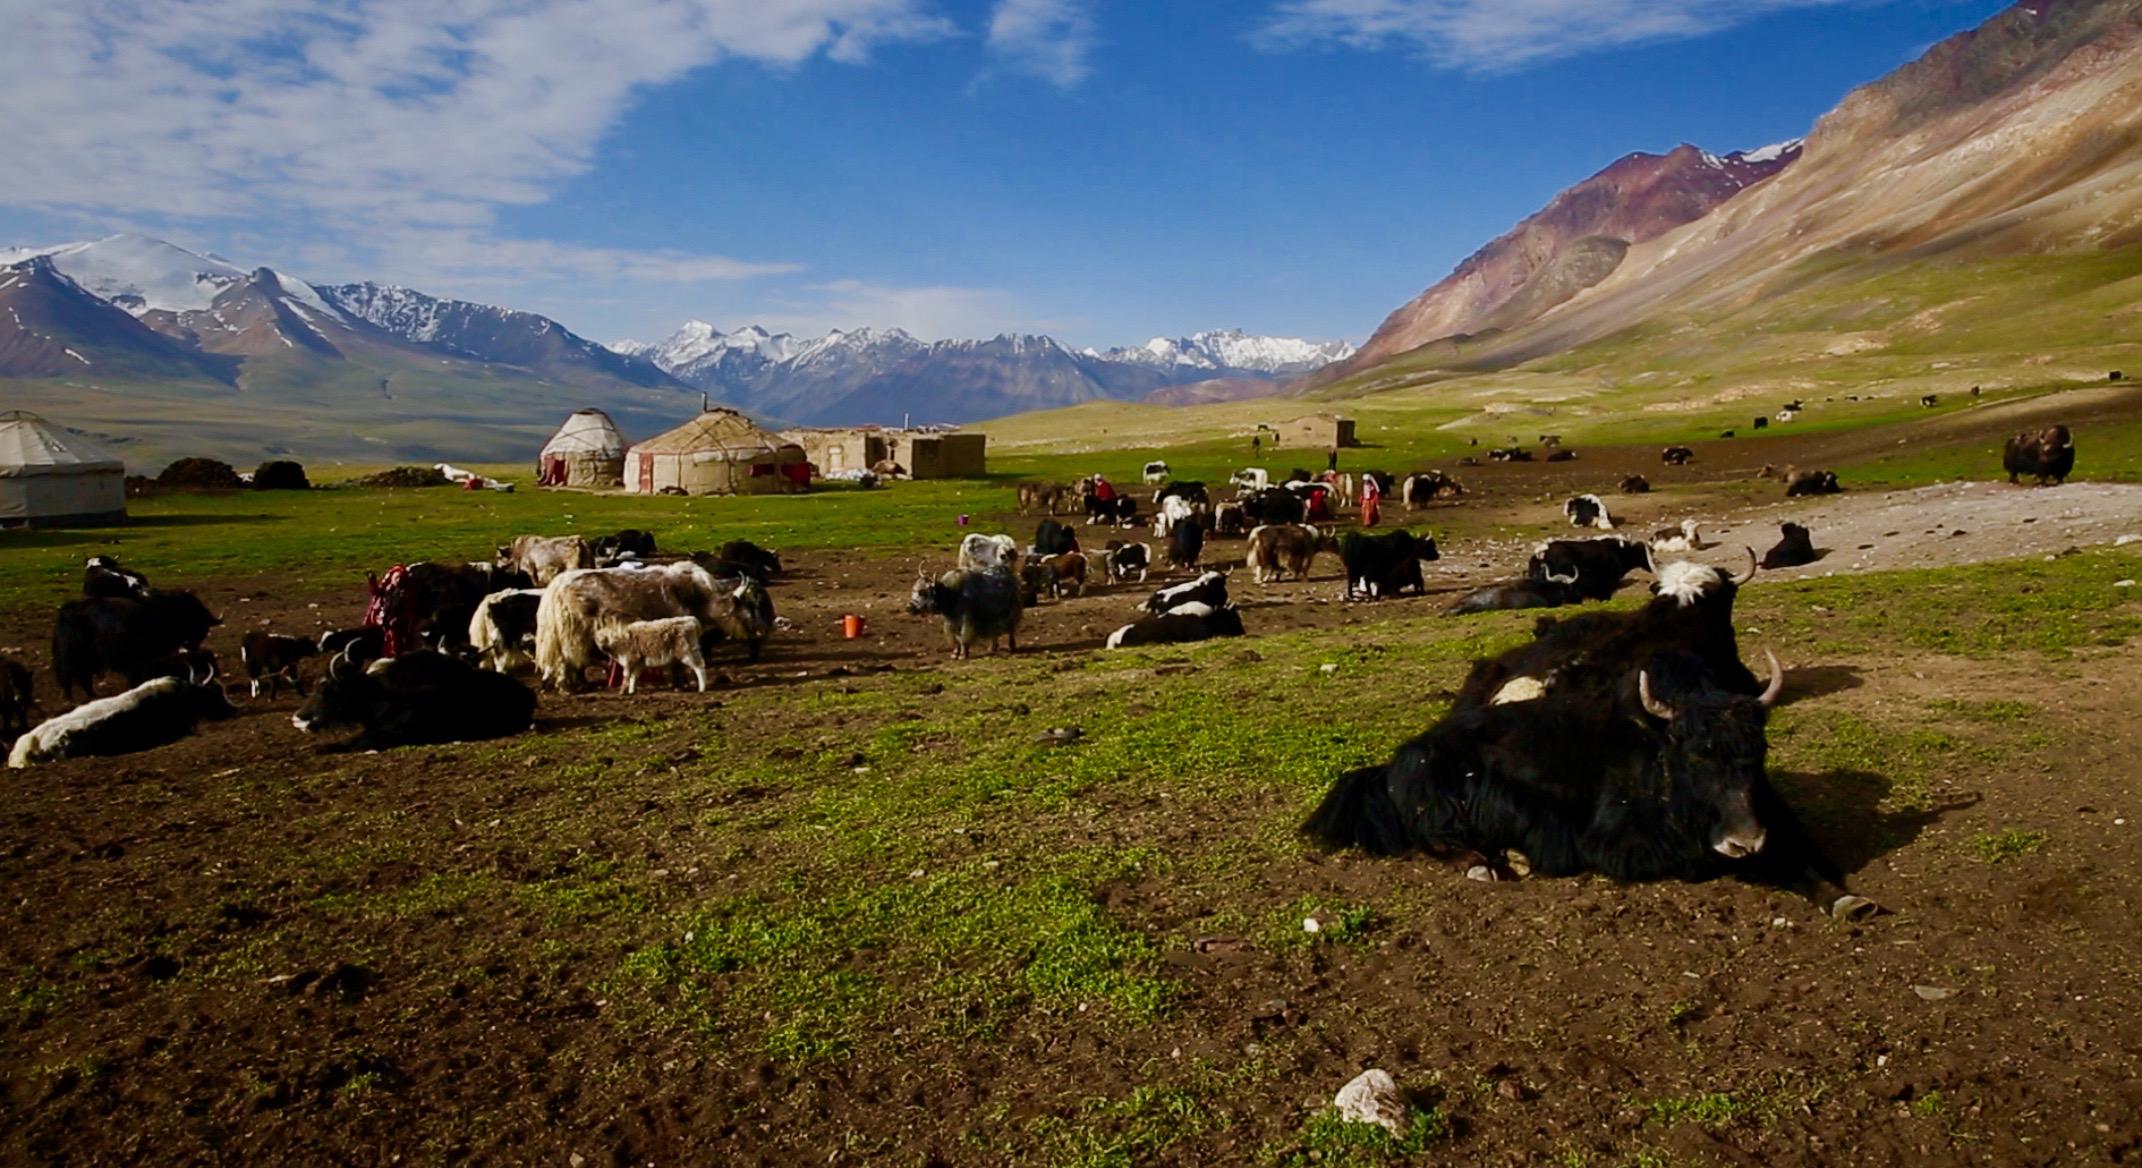 Nomadic Tribe in Afghanistan